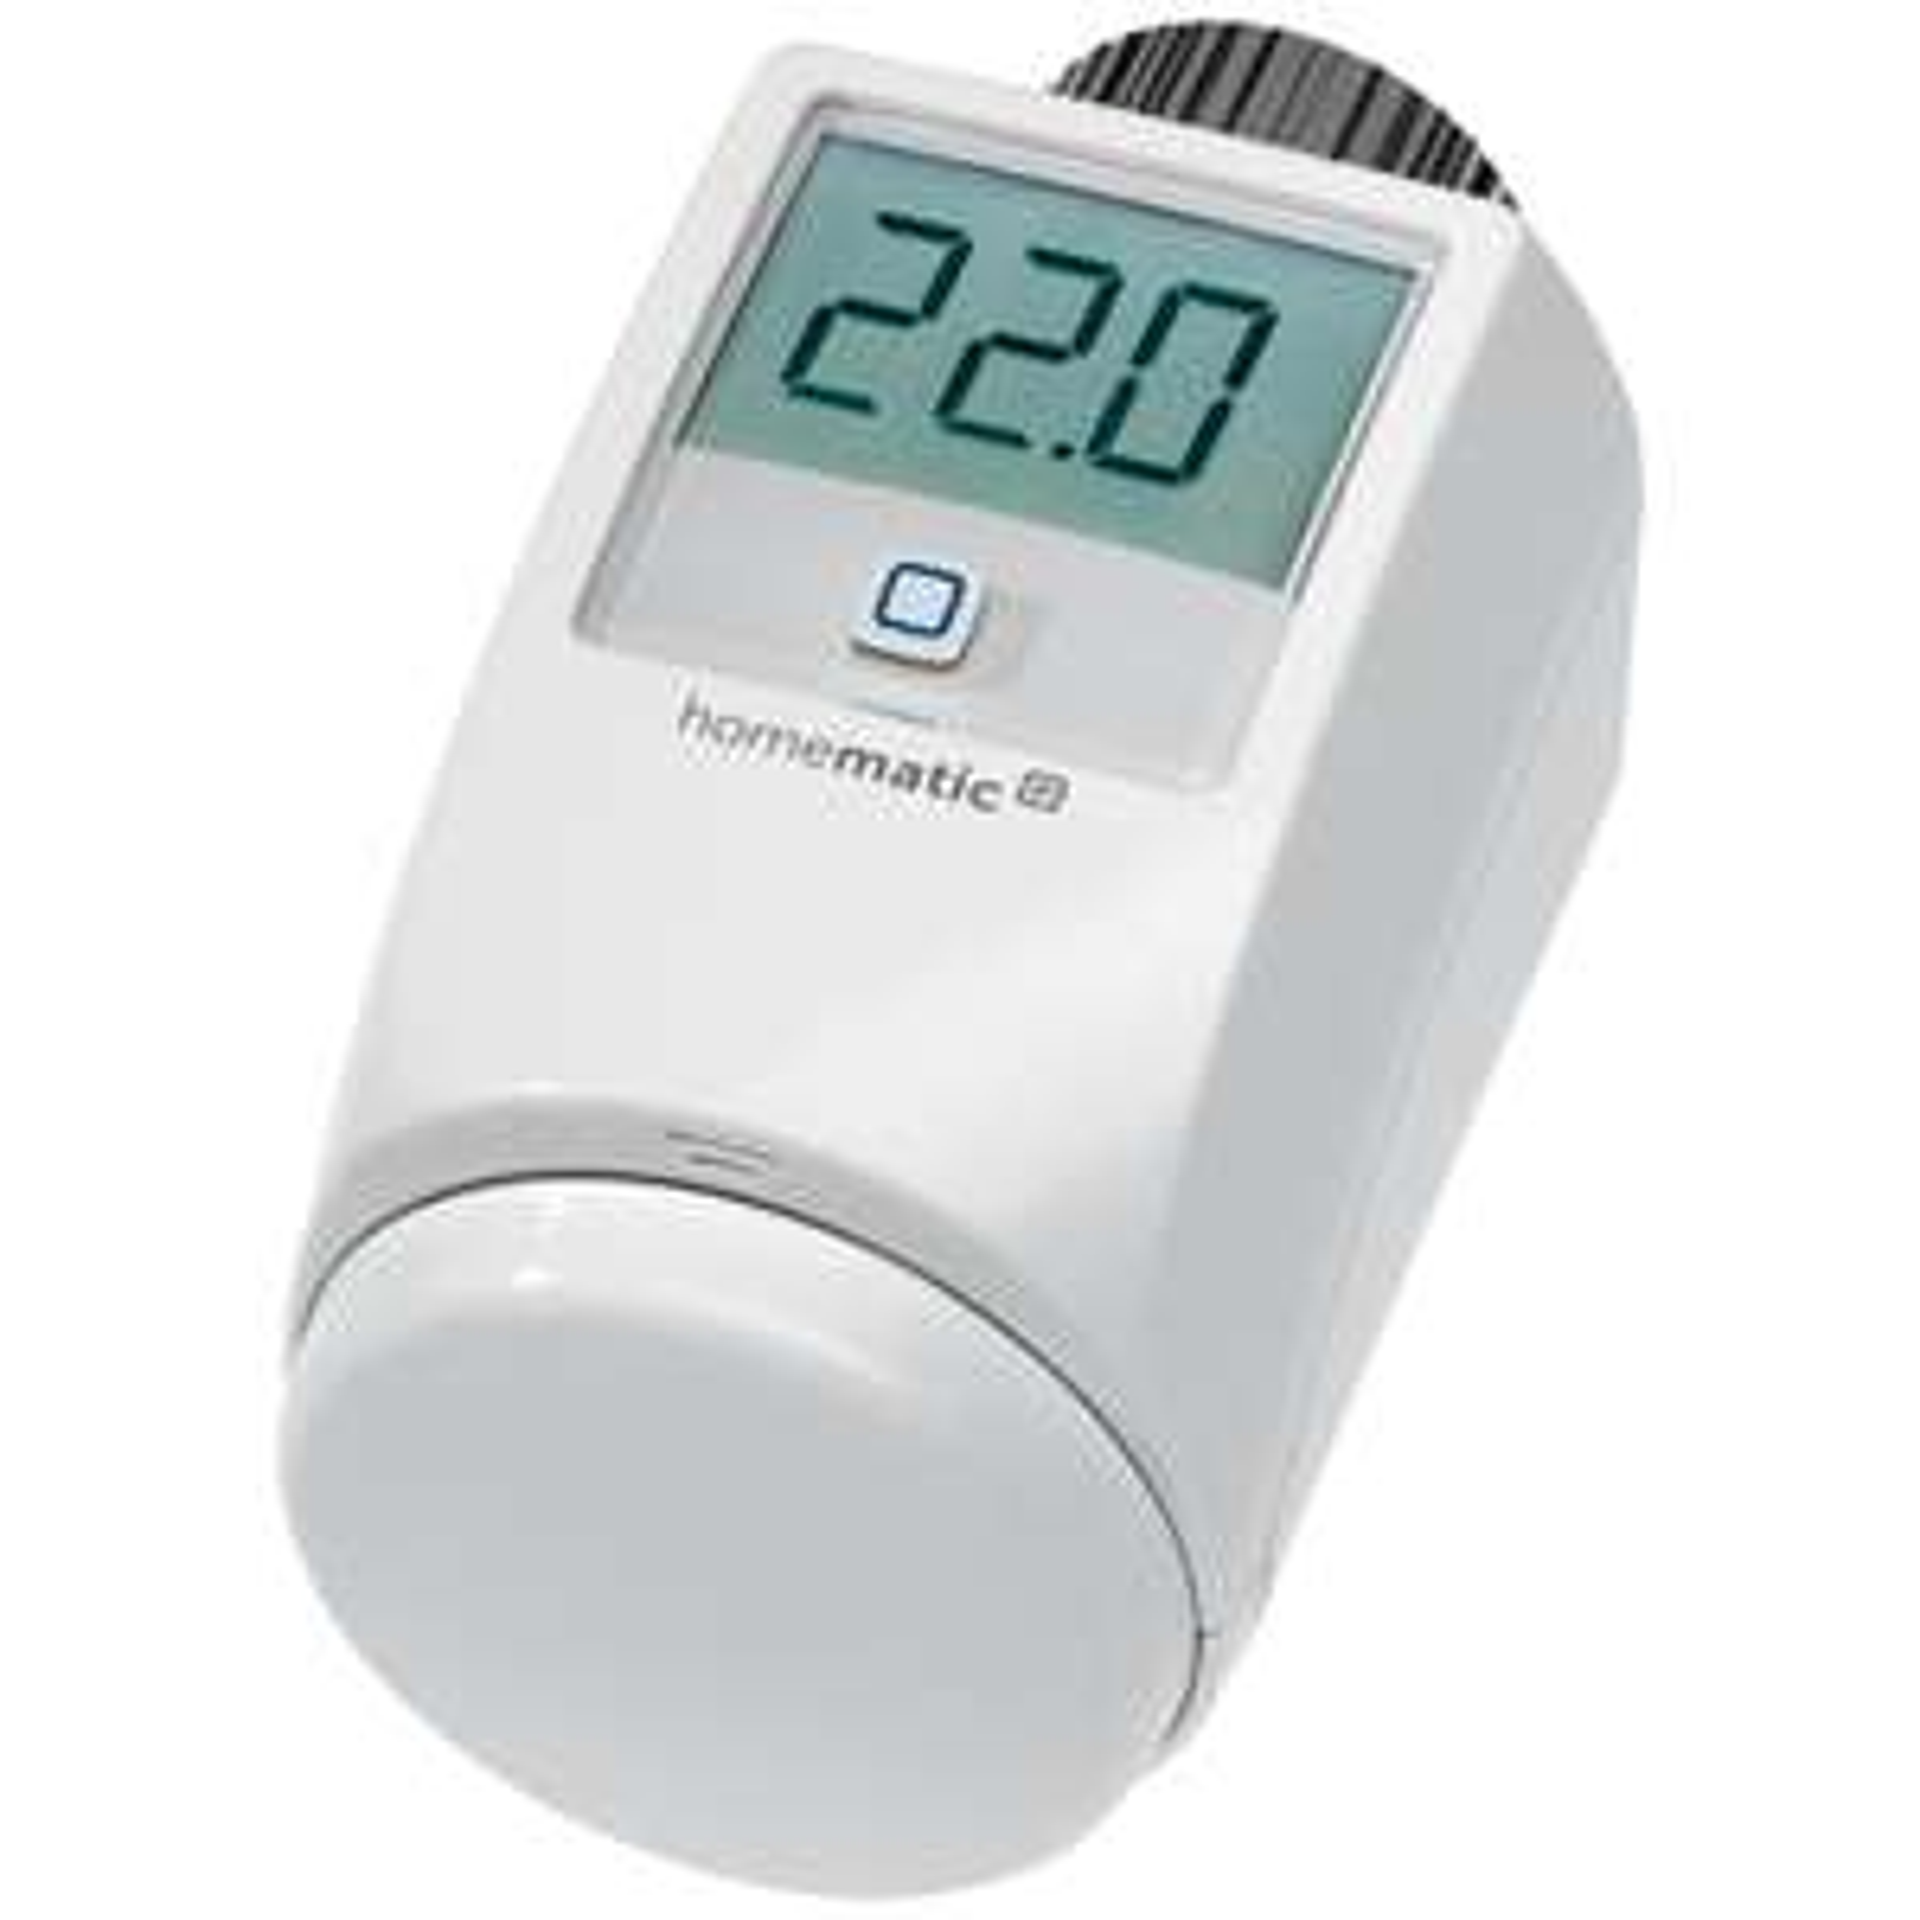 Homematic IP Komplettbausatz Heizkörperthermostat HmIP-eTRV-2, für Smart Home / Hausautomation